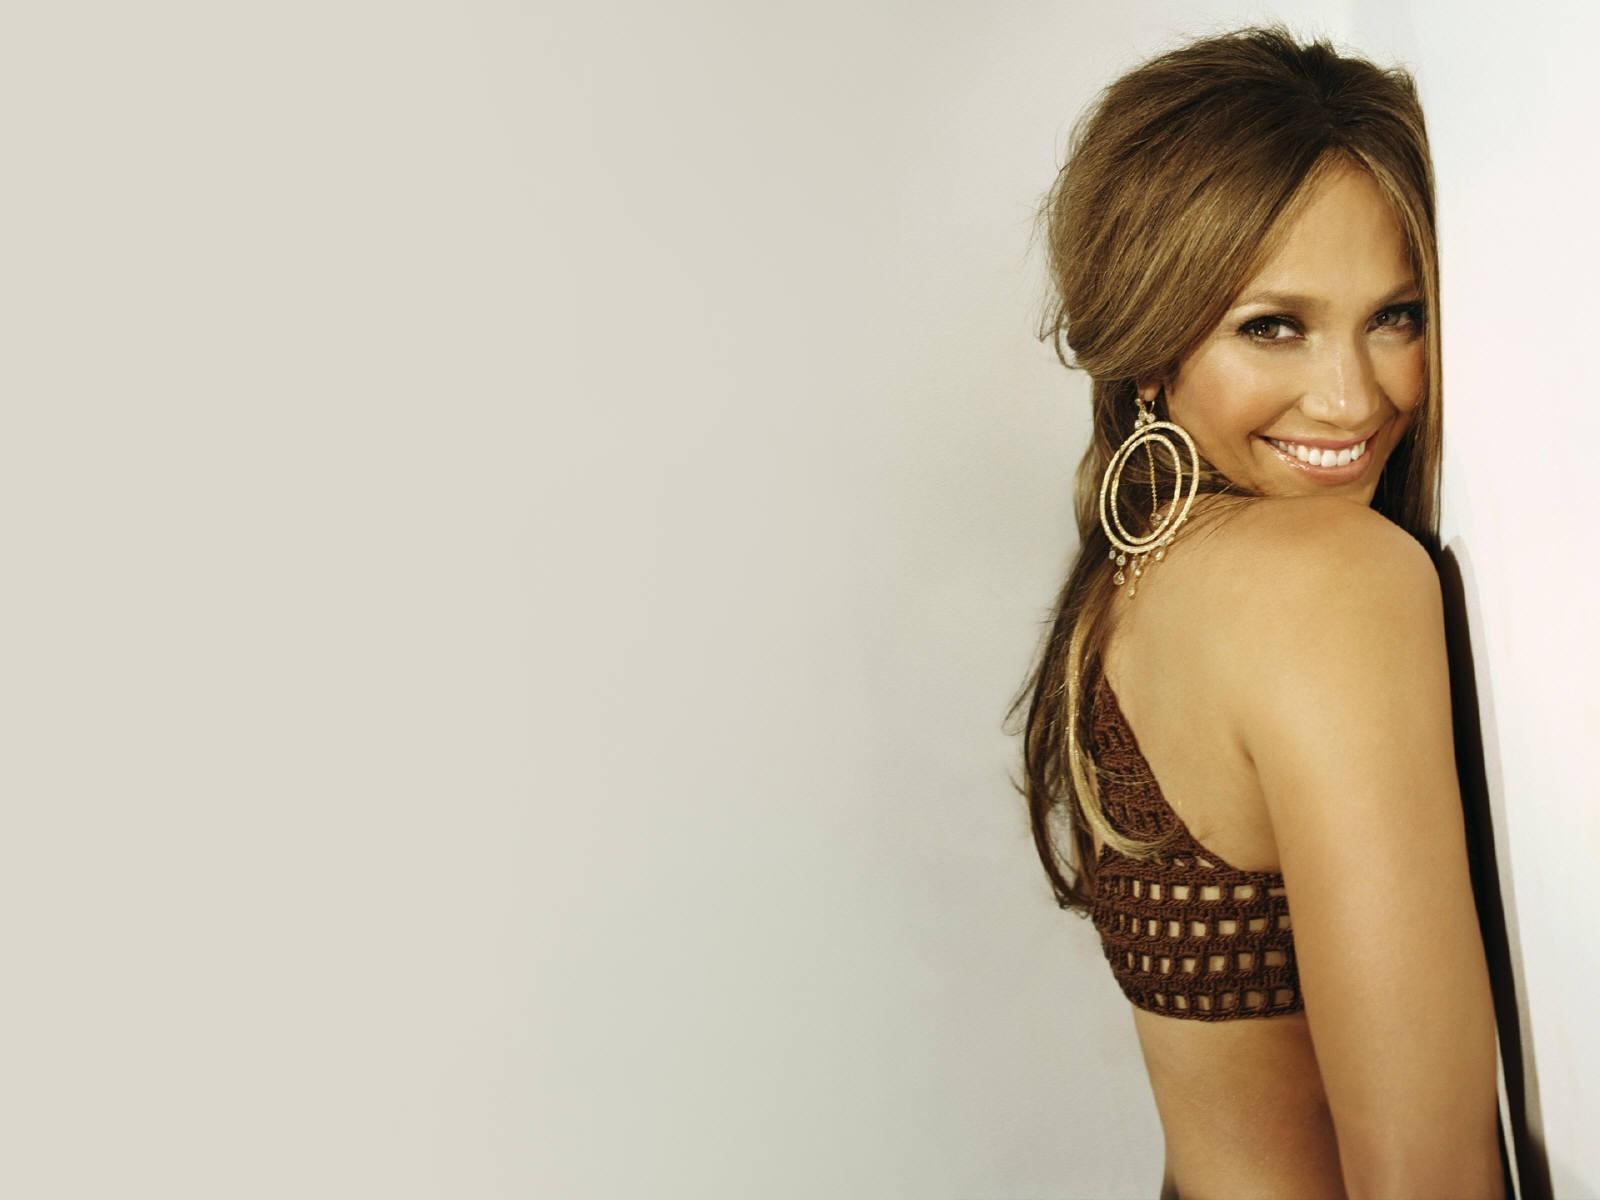 Wallpaper di Jennifer Lopez, sexy e spiritosa